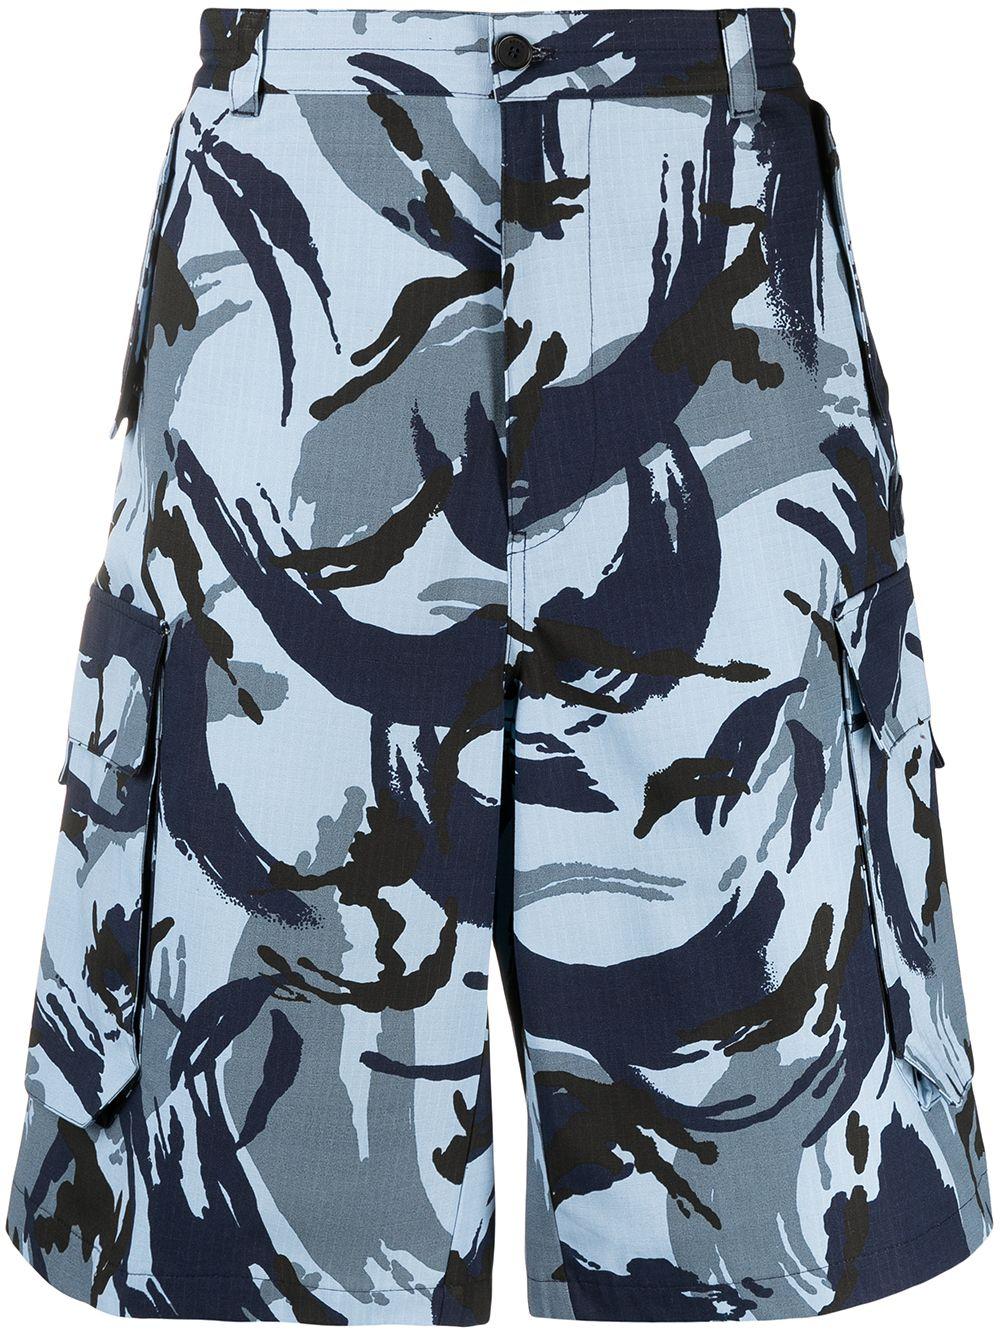 Kenzo Cargo-Shorts mit Tropic Camo-Print - Blau